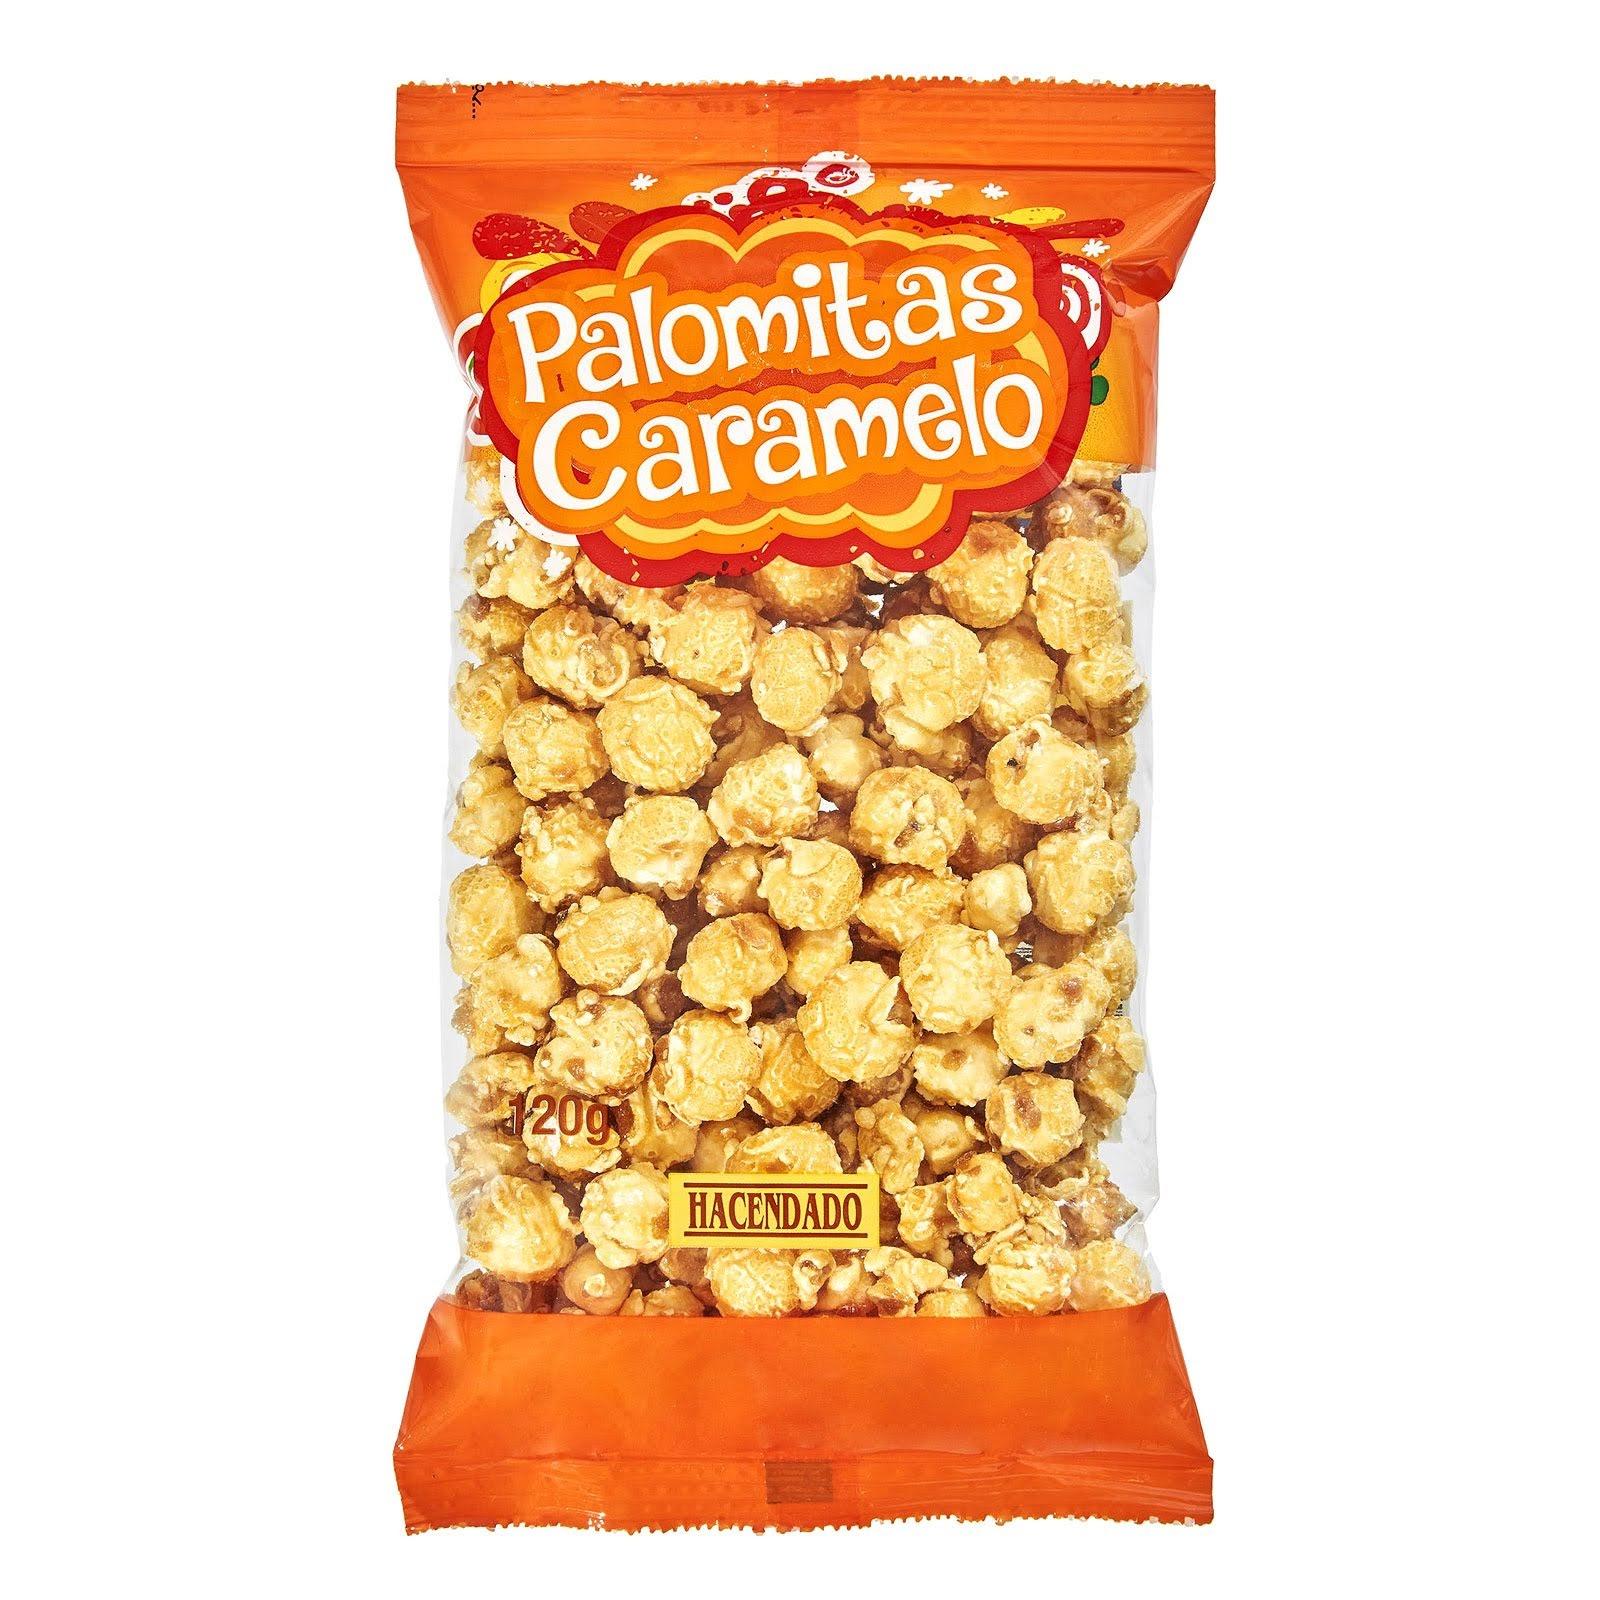 Palomitas con caramelo Hacendado